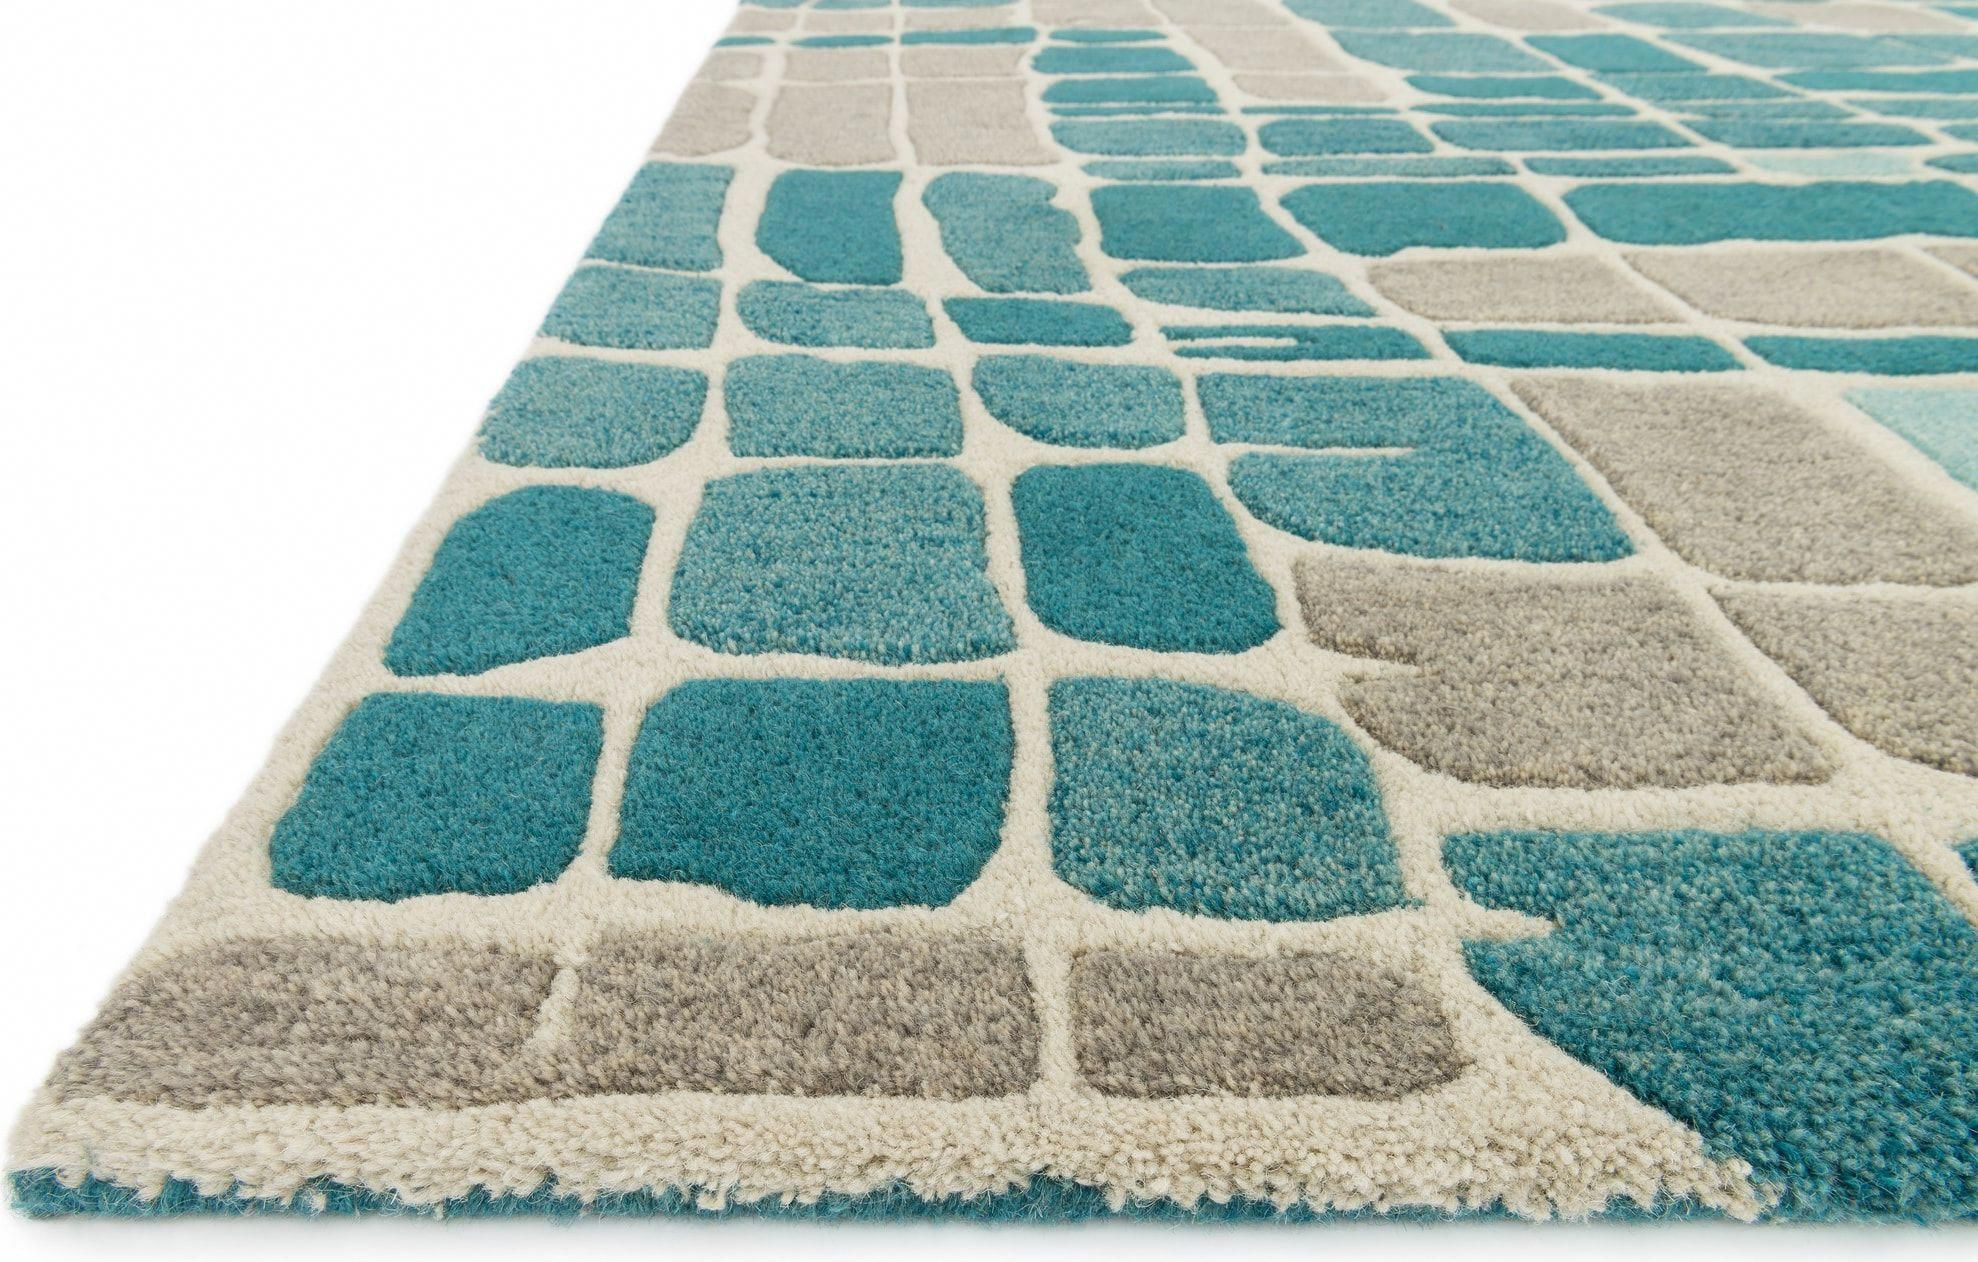 Pin On Carpet Design Creative